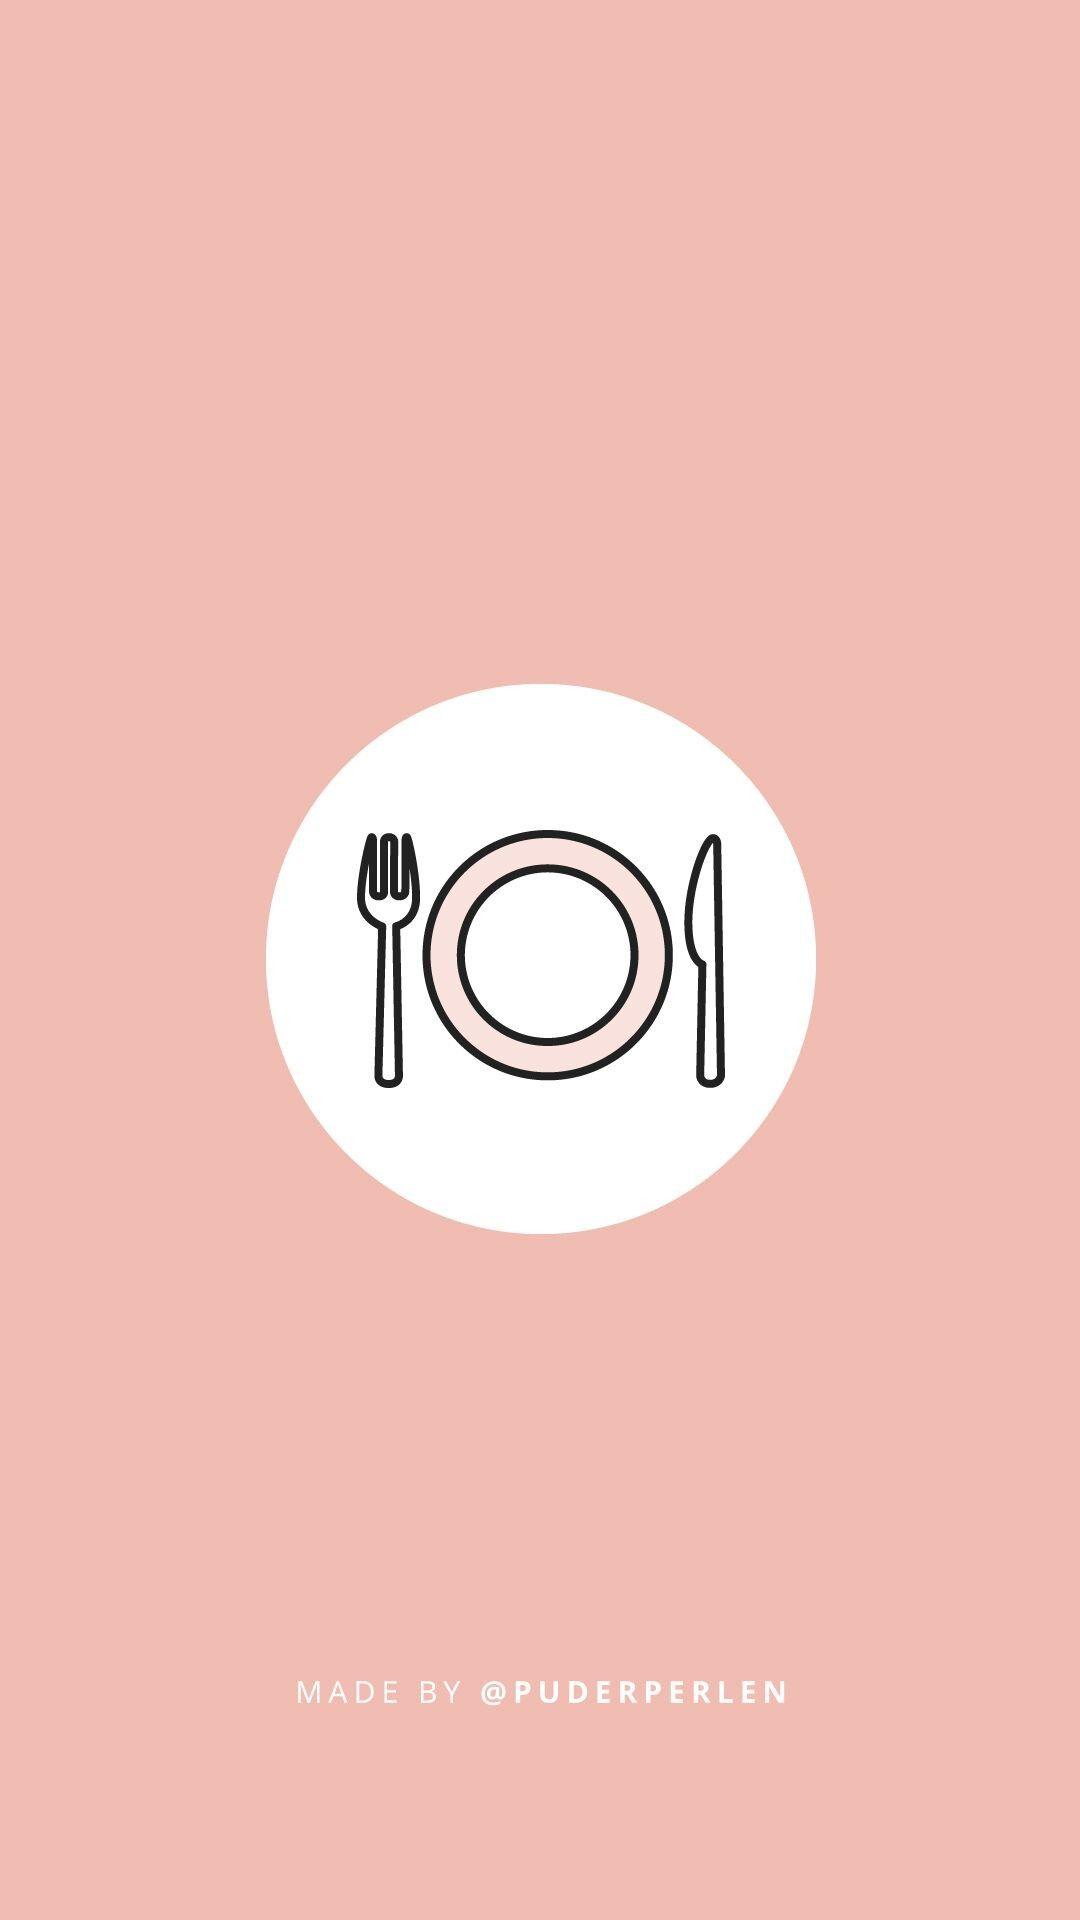 Food Find More Puderperlen Or Puderperlen Blogspot Instagram